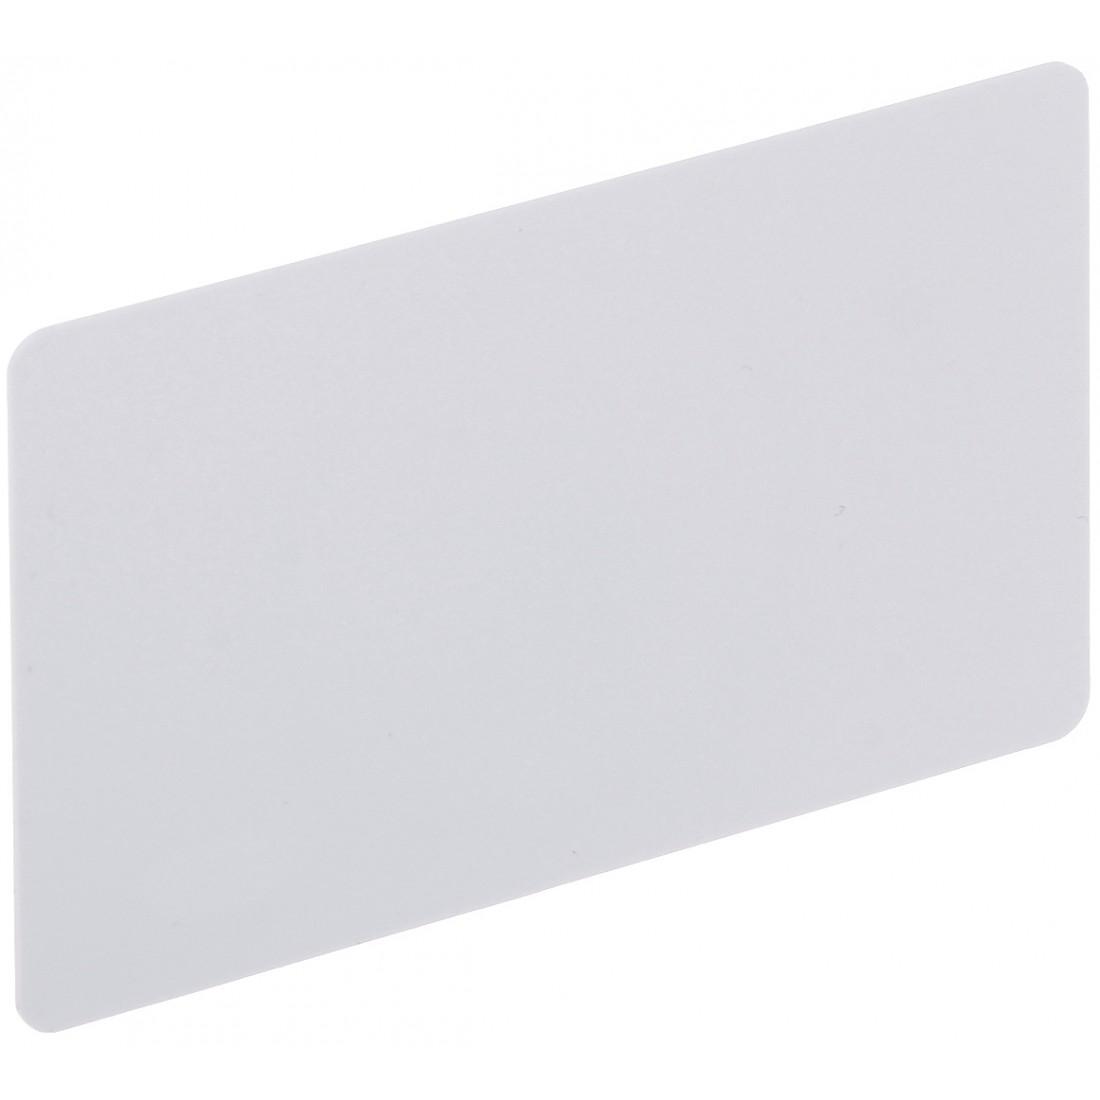 BEZKONTAKTNÁ KARTA PVC ATLO-104*P10